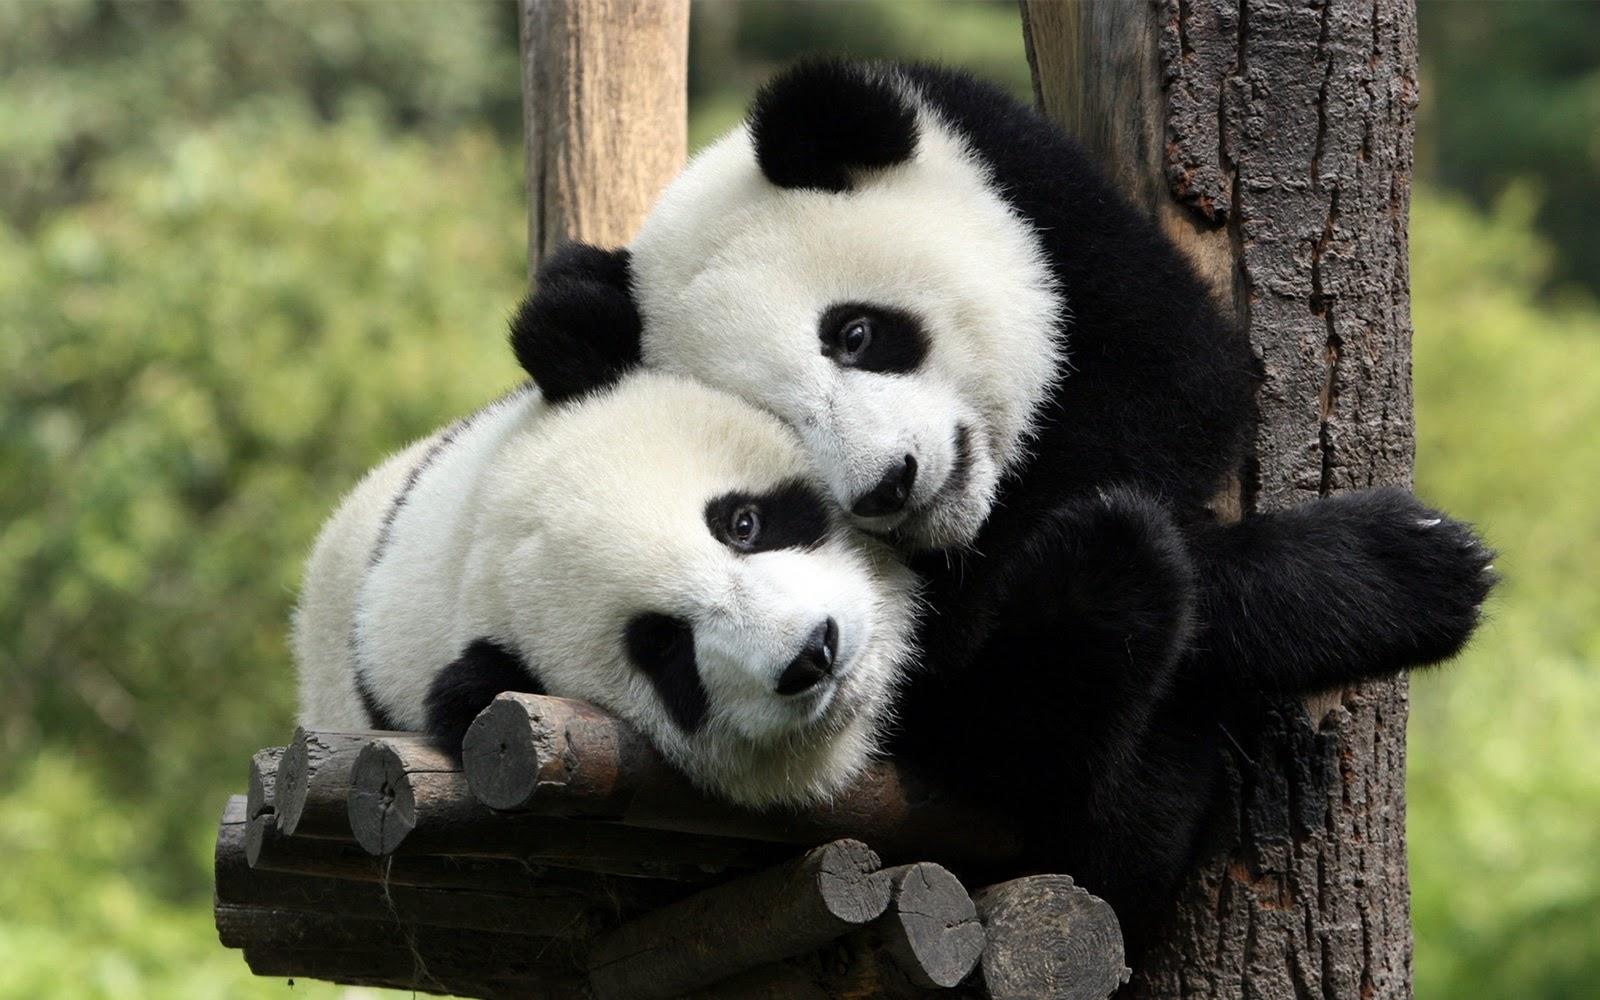 ANIMALS WALLPAPERS: panda cool funny /panda cool funny ...